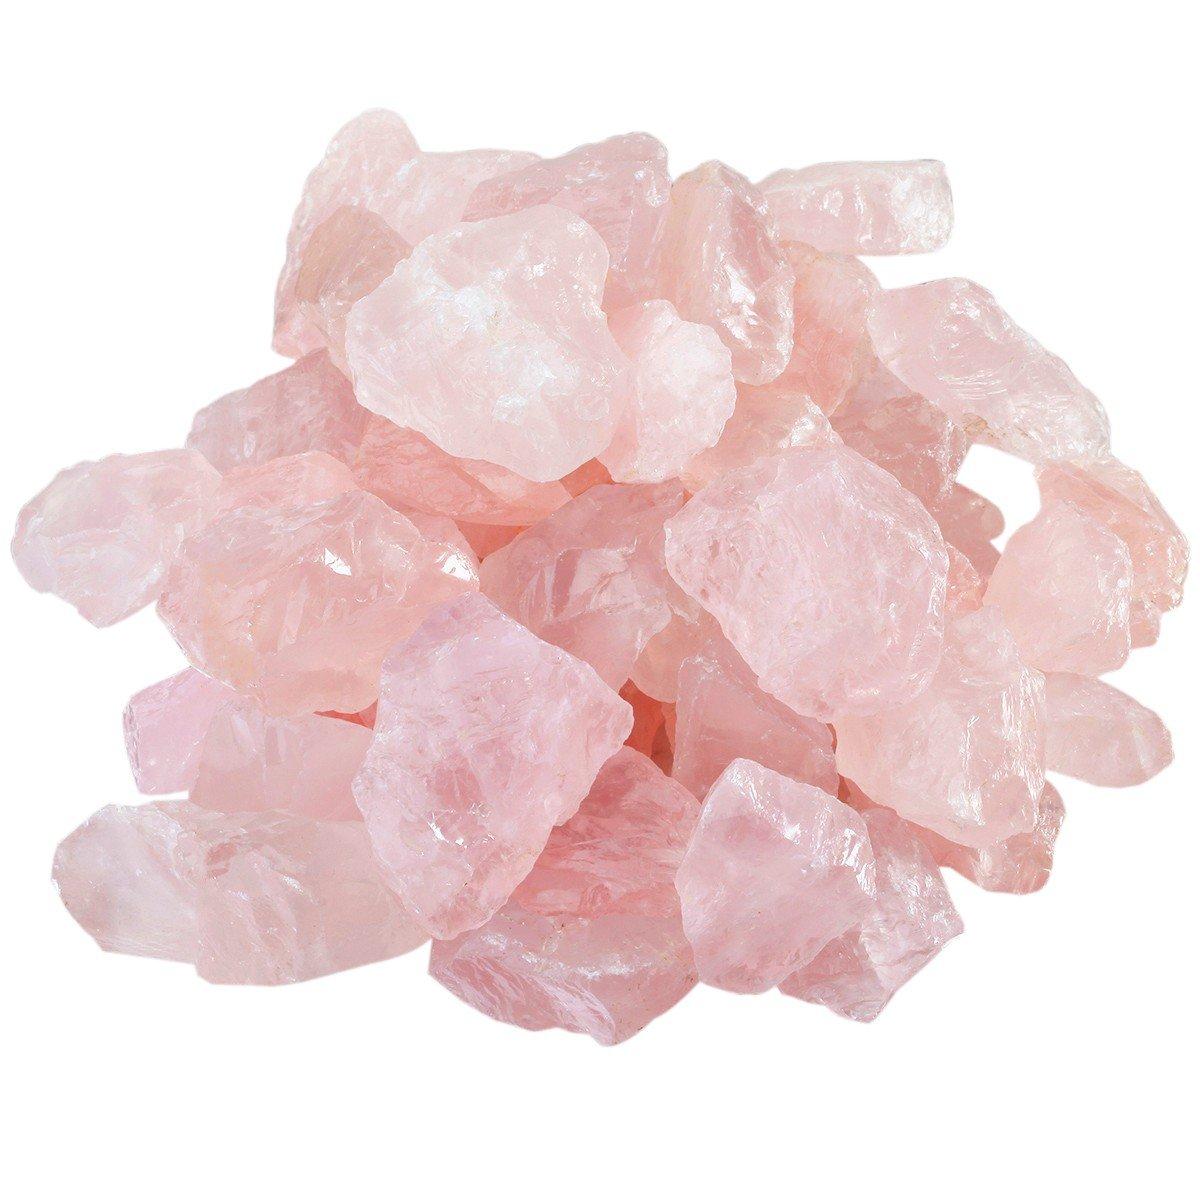 rockcloud 1 lb Natural Crystals Raw Rough Stones for Cabbing,Tumbling,Cutting,Lapidary,Polishing,Reiki Crytsal Healing,Rose Quartz